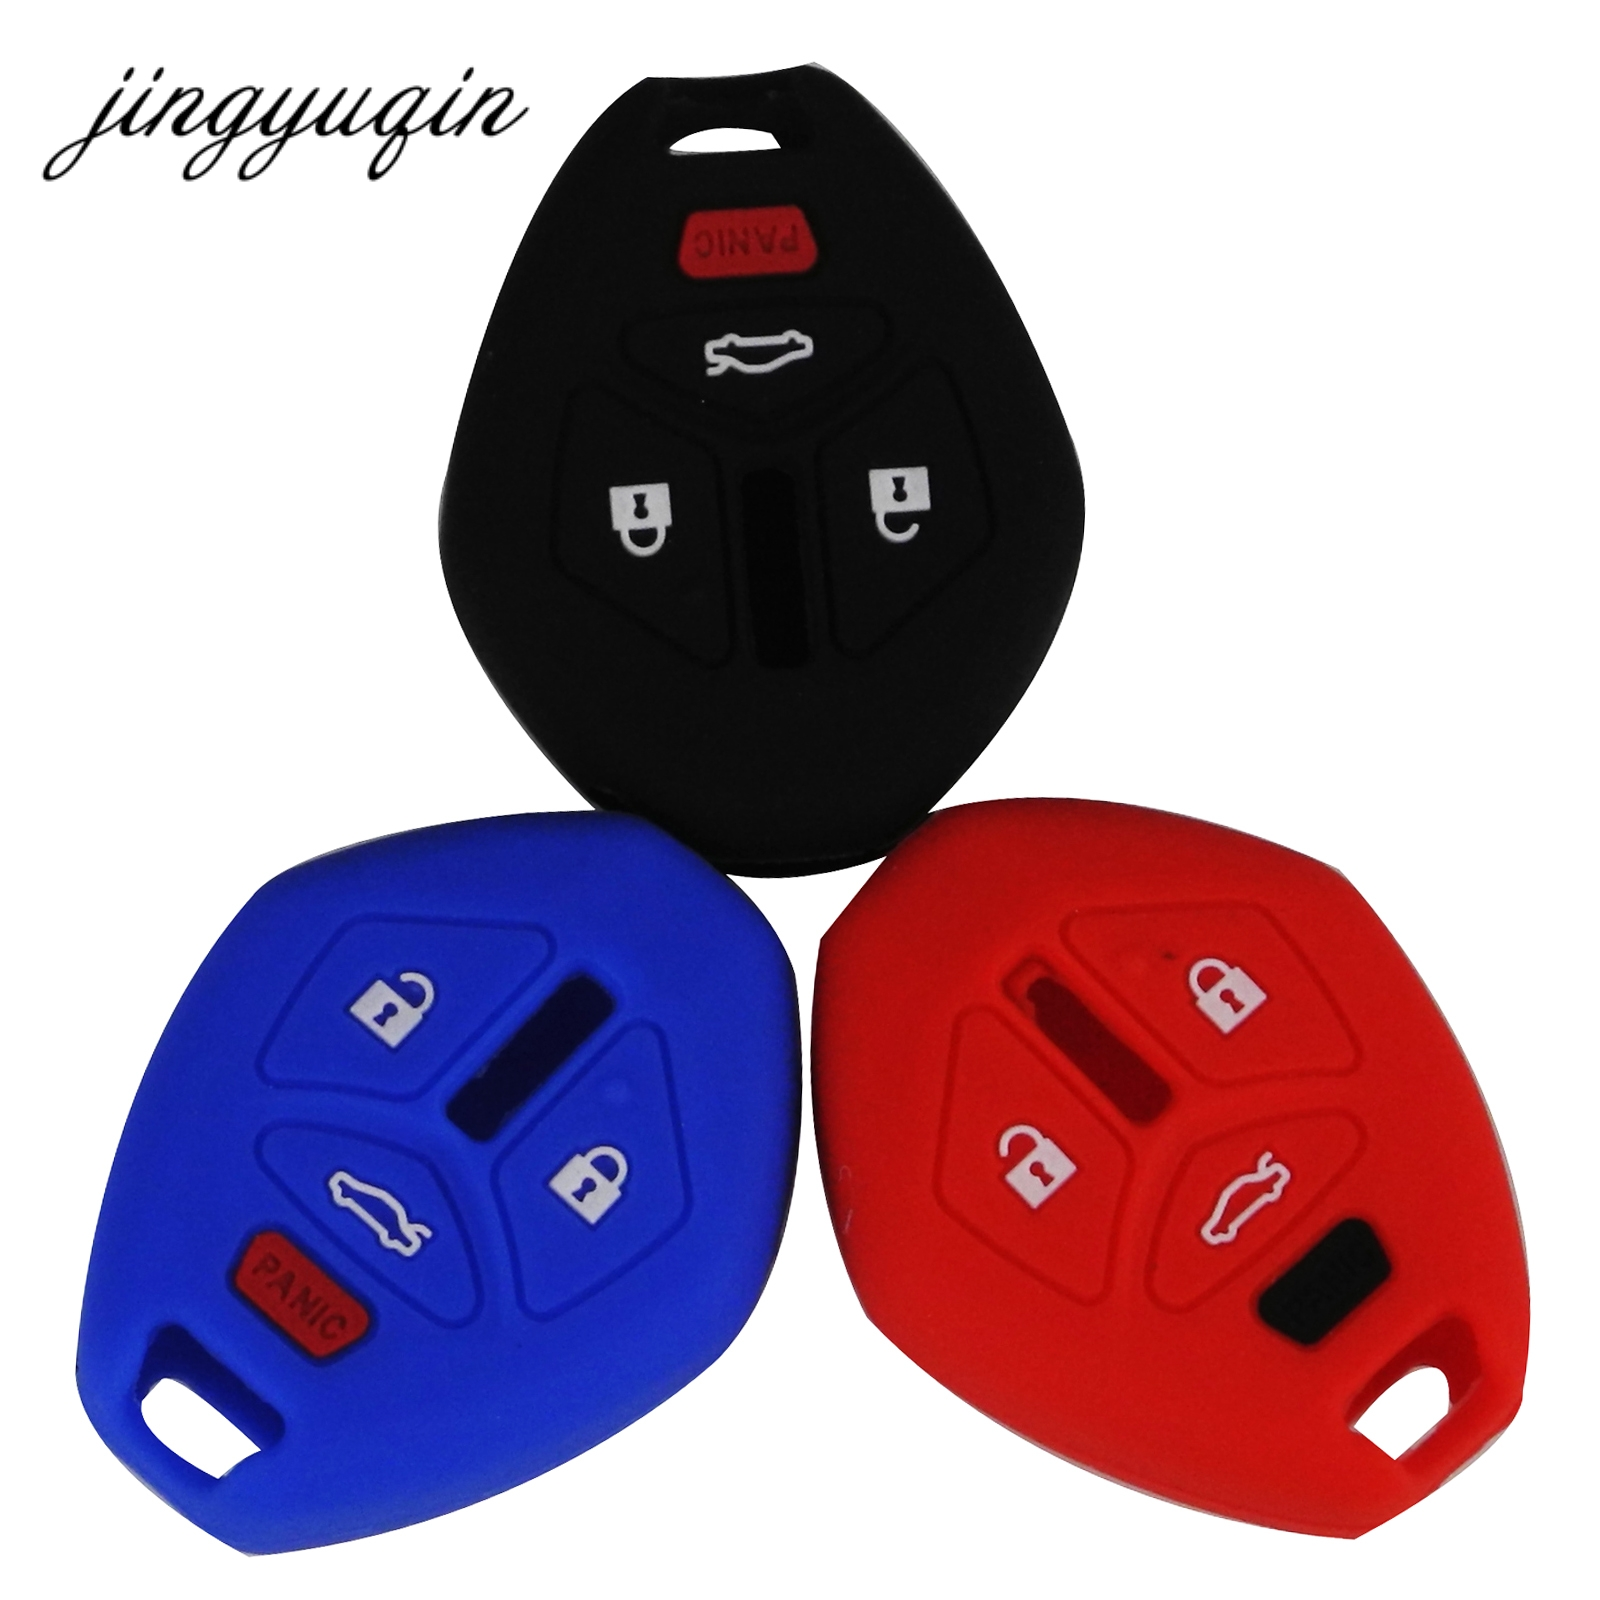 jingyuqin 30pcs/lot Silicone Rubber Key fob Scase for Mitsubishi Eclipse Galant Lancer Raider Endeavor Outlander Remote Cover